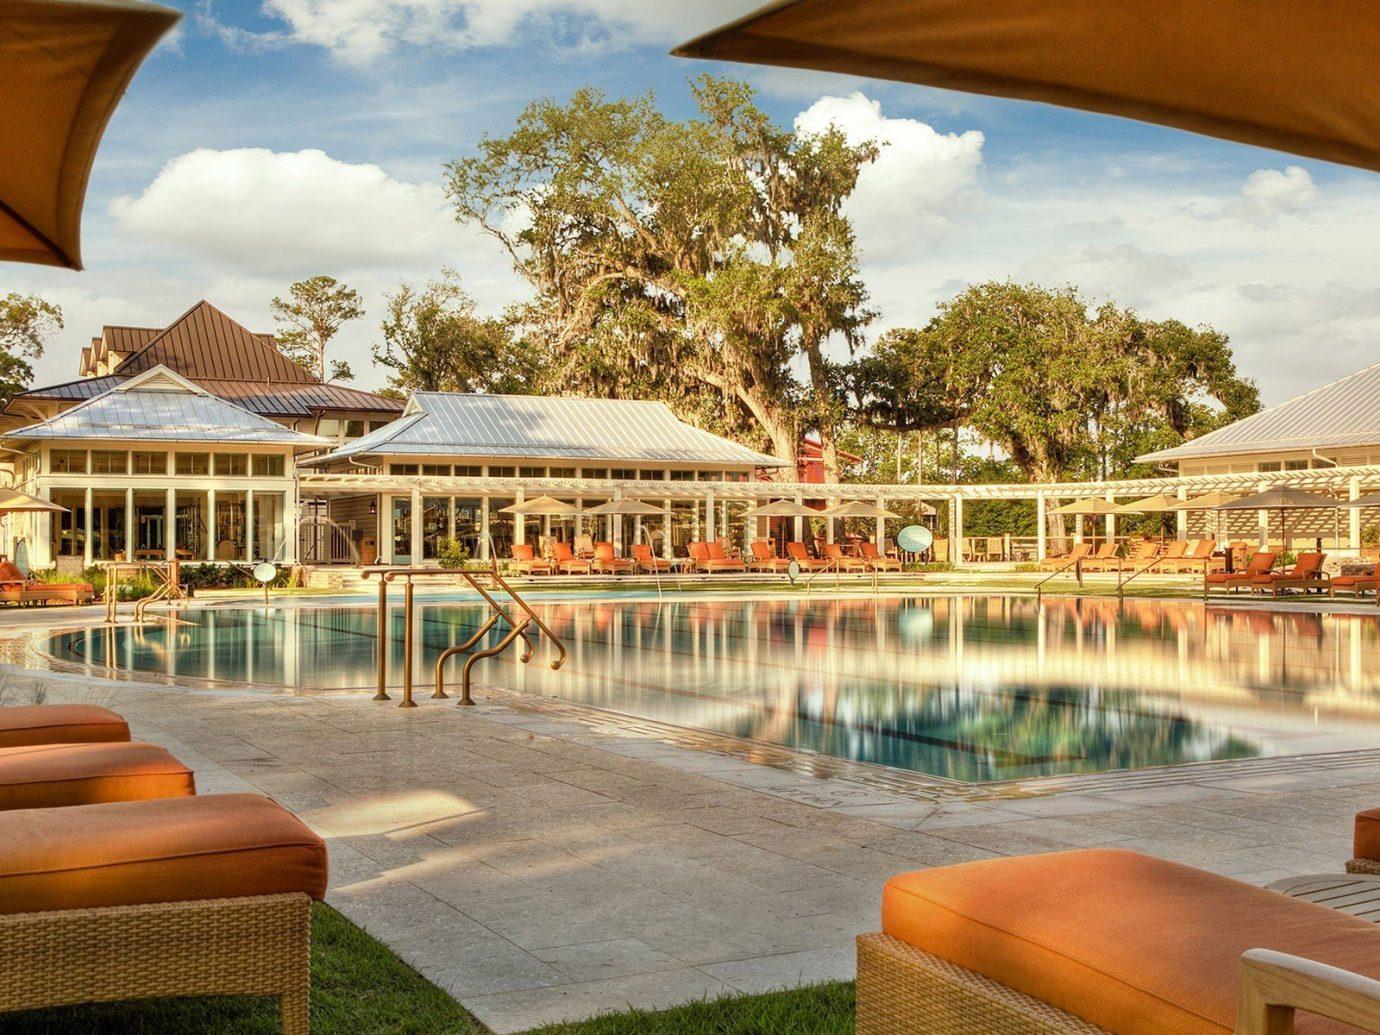 Hotels outdoor chair leisure Resort vacation swimming pool estate orange palace Villa hacienda furniture